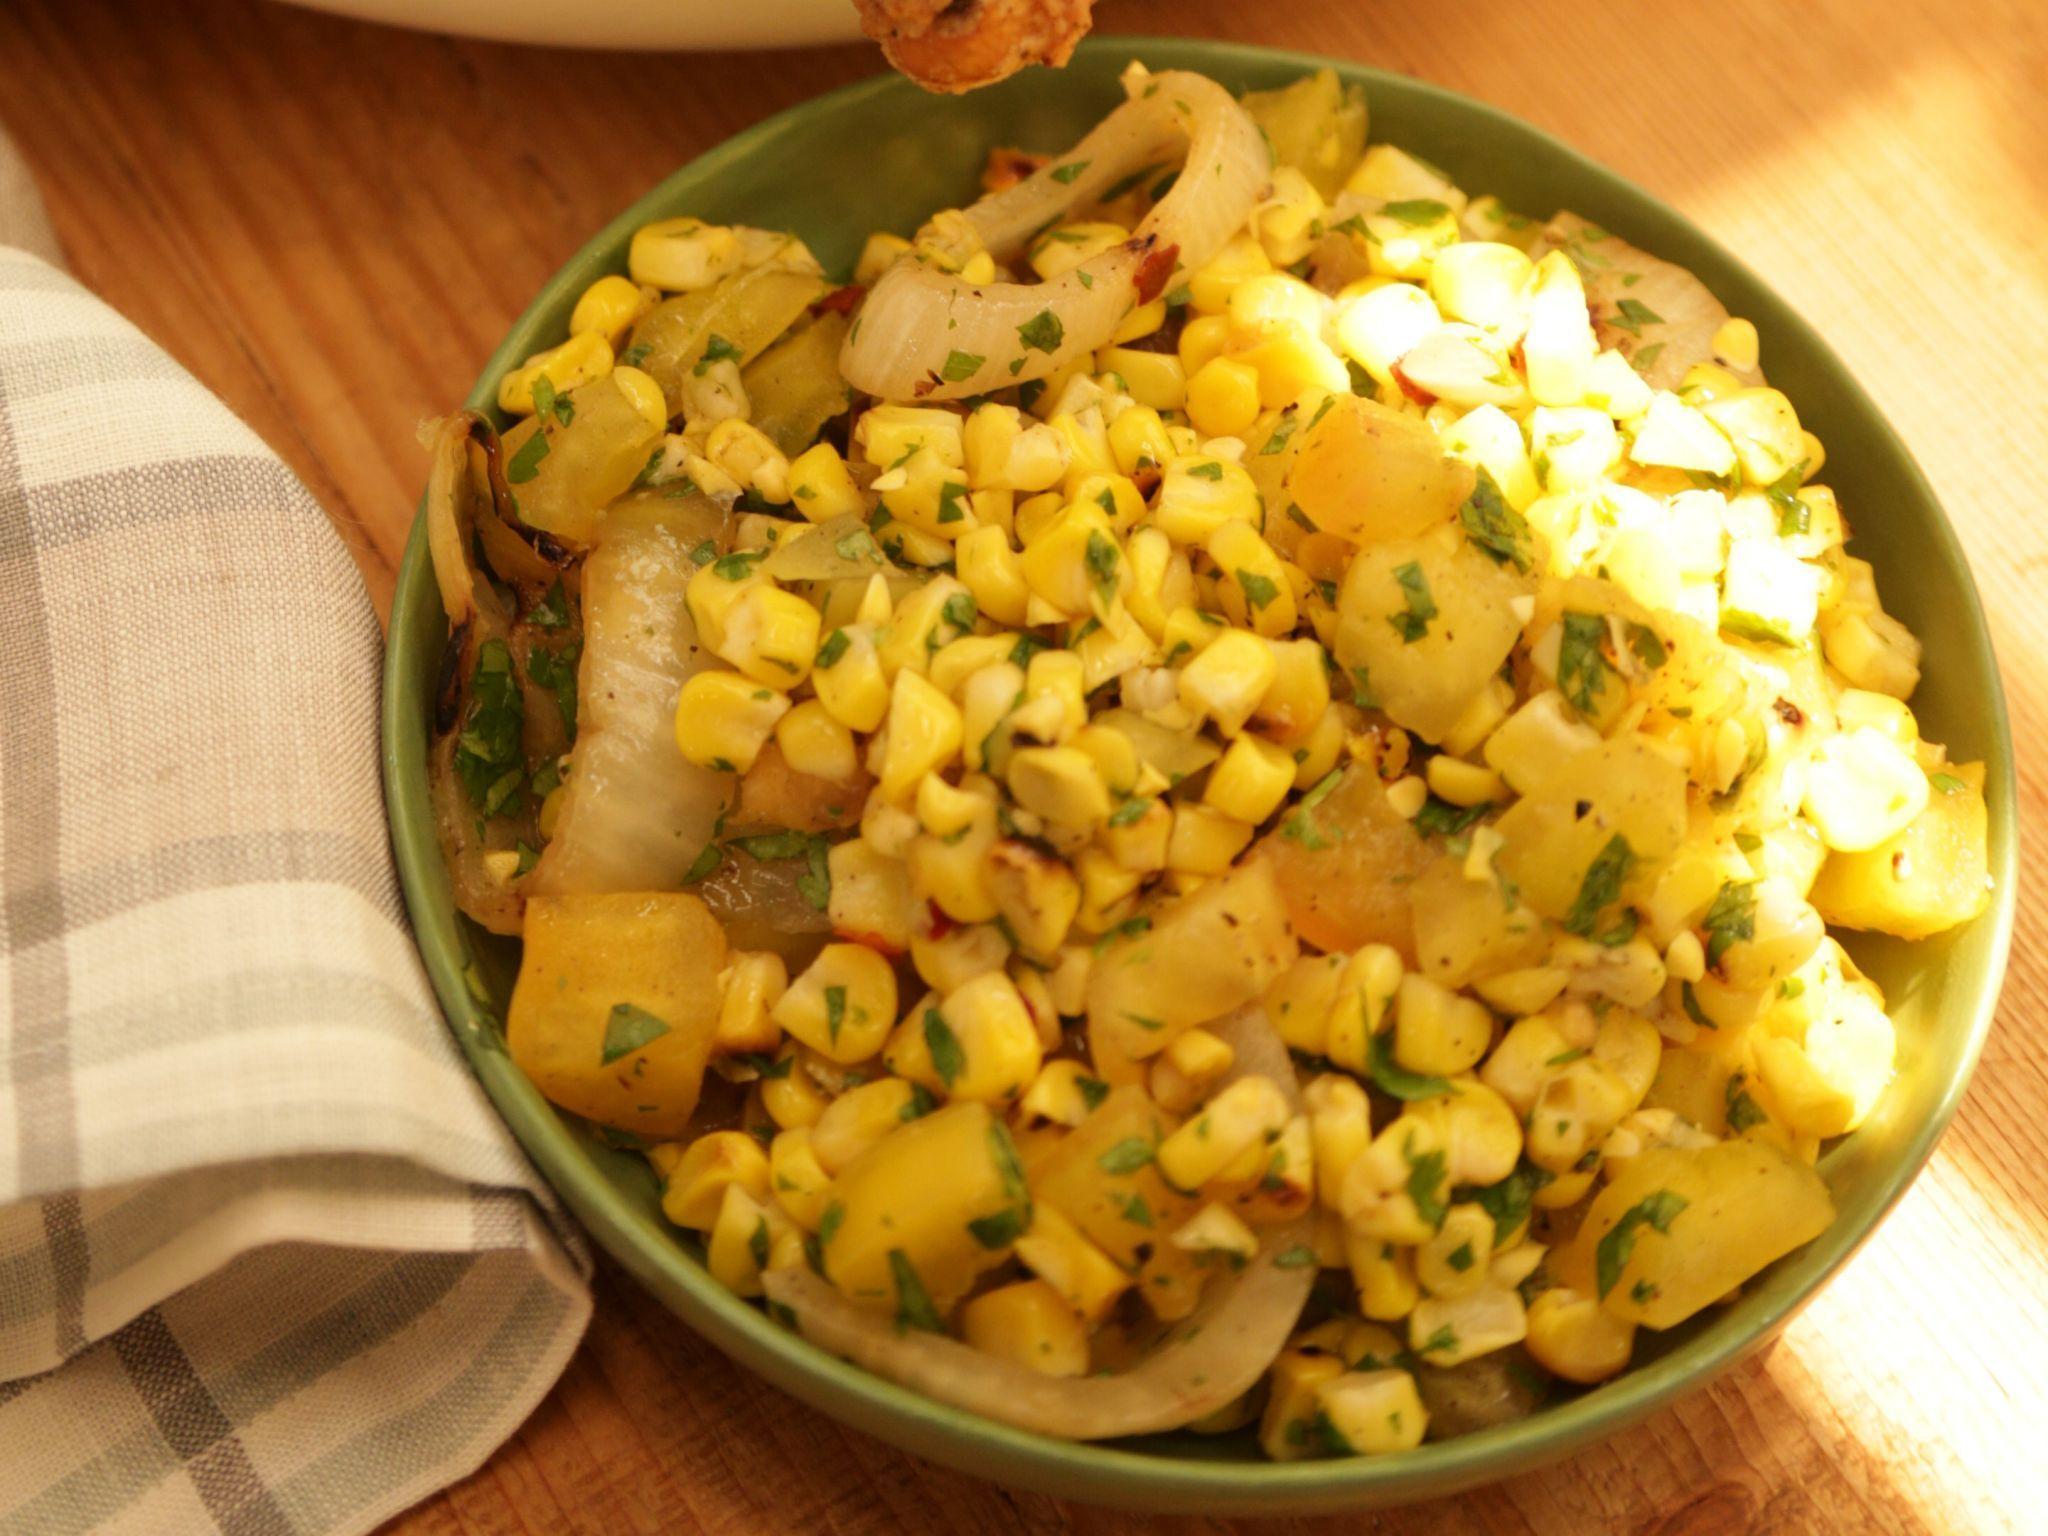 Corn and Vidalia Onion Salad recipe from The Kitchen via Food Network